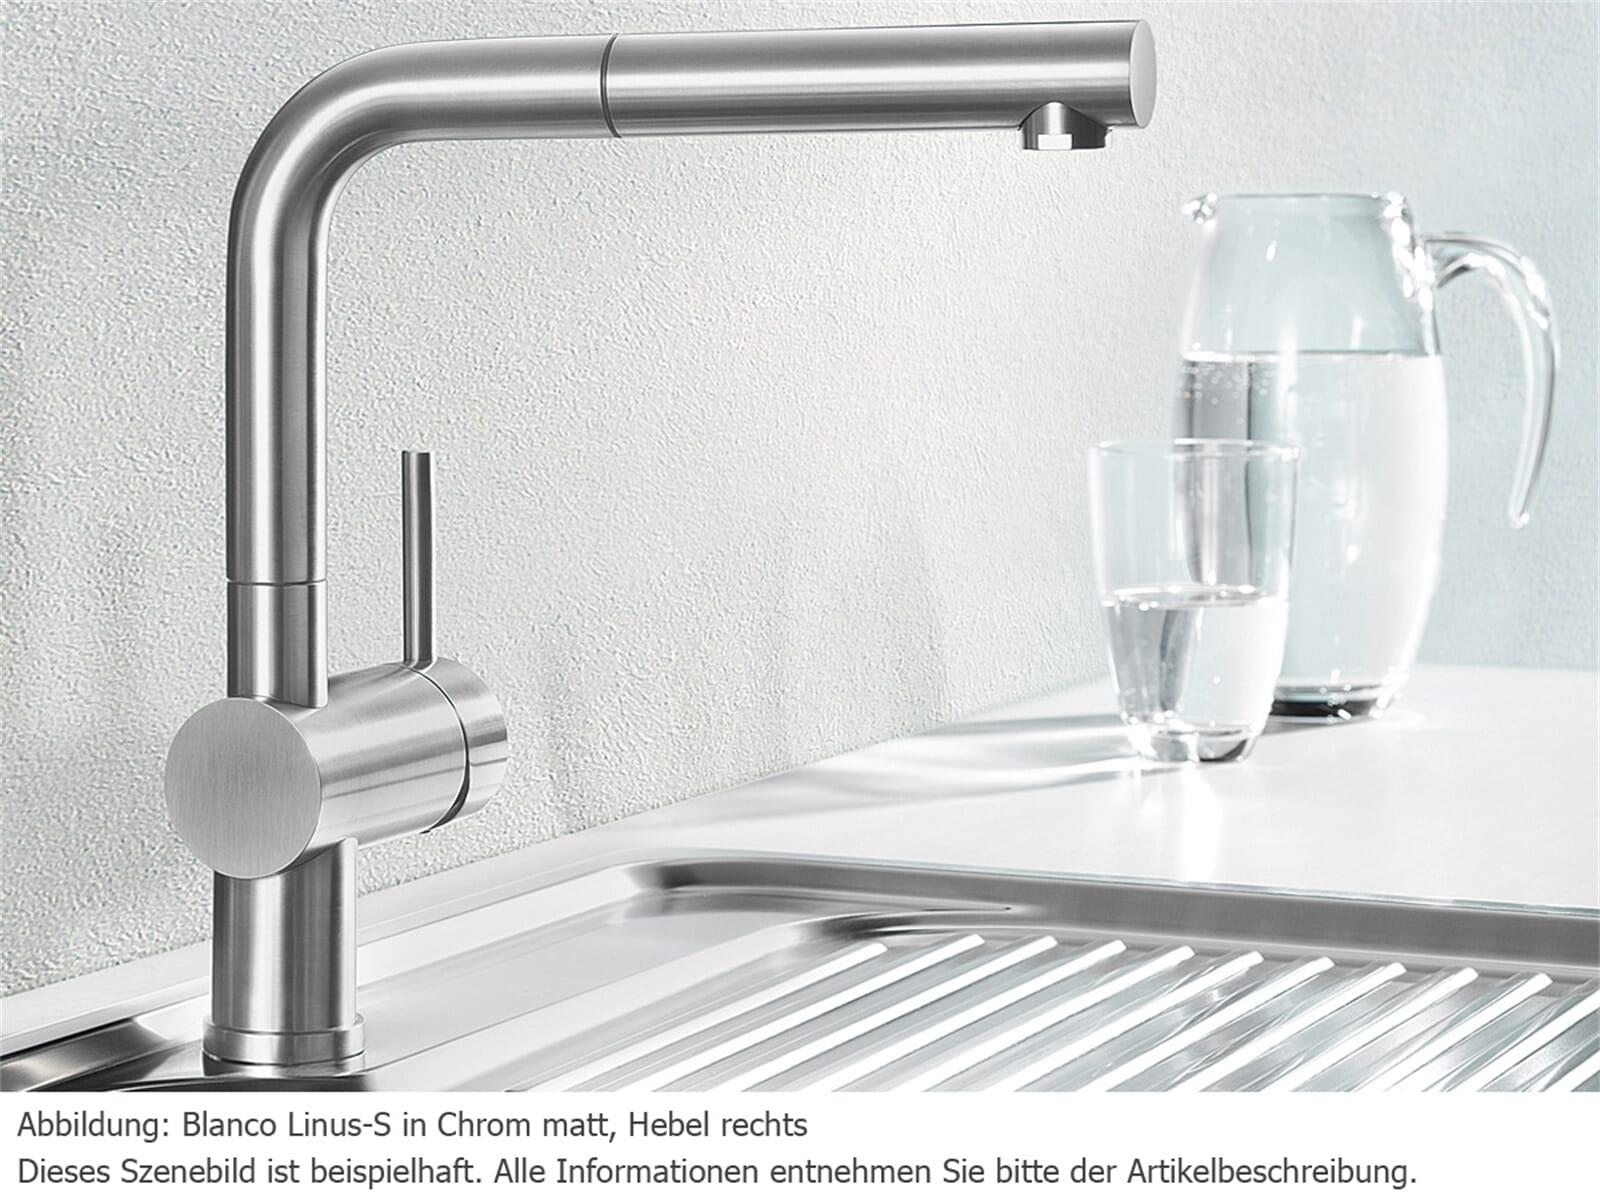 blanco linus s chrom matt niederdruck armatur f r 254 90 eur. Black Bedroom Furniture Sets. Home Design Ideas